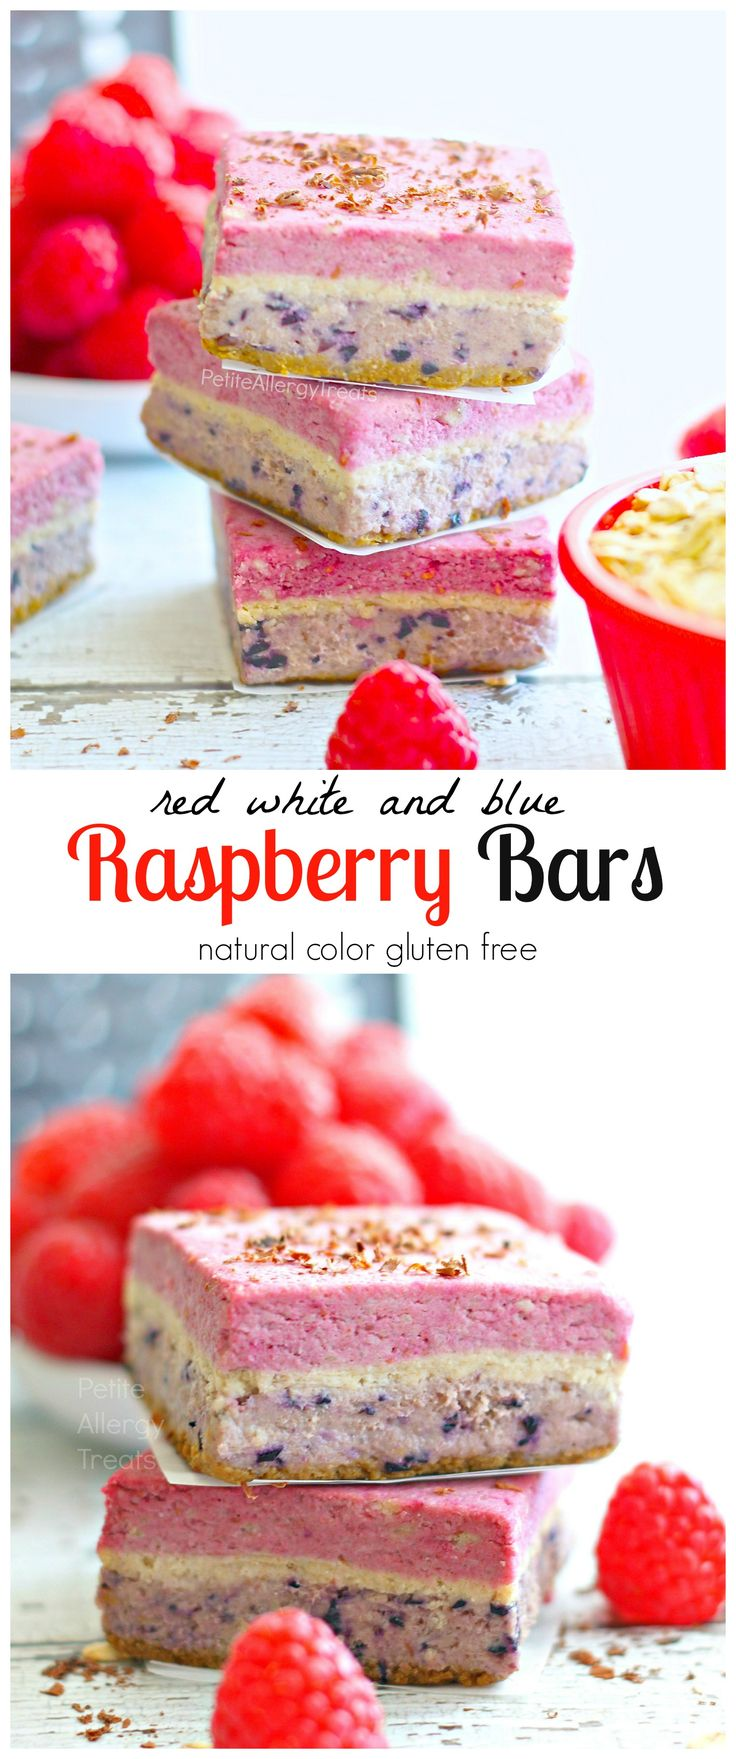 Raspberry Bars (Raw Vegan Gluten Free) Naturally red, white and blue, bursting with raspberry!